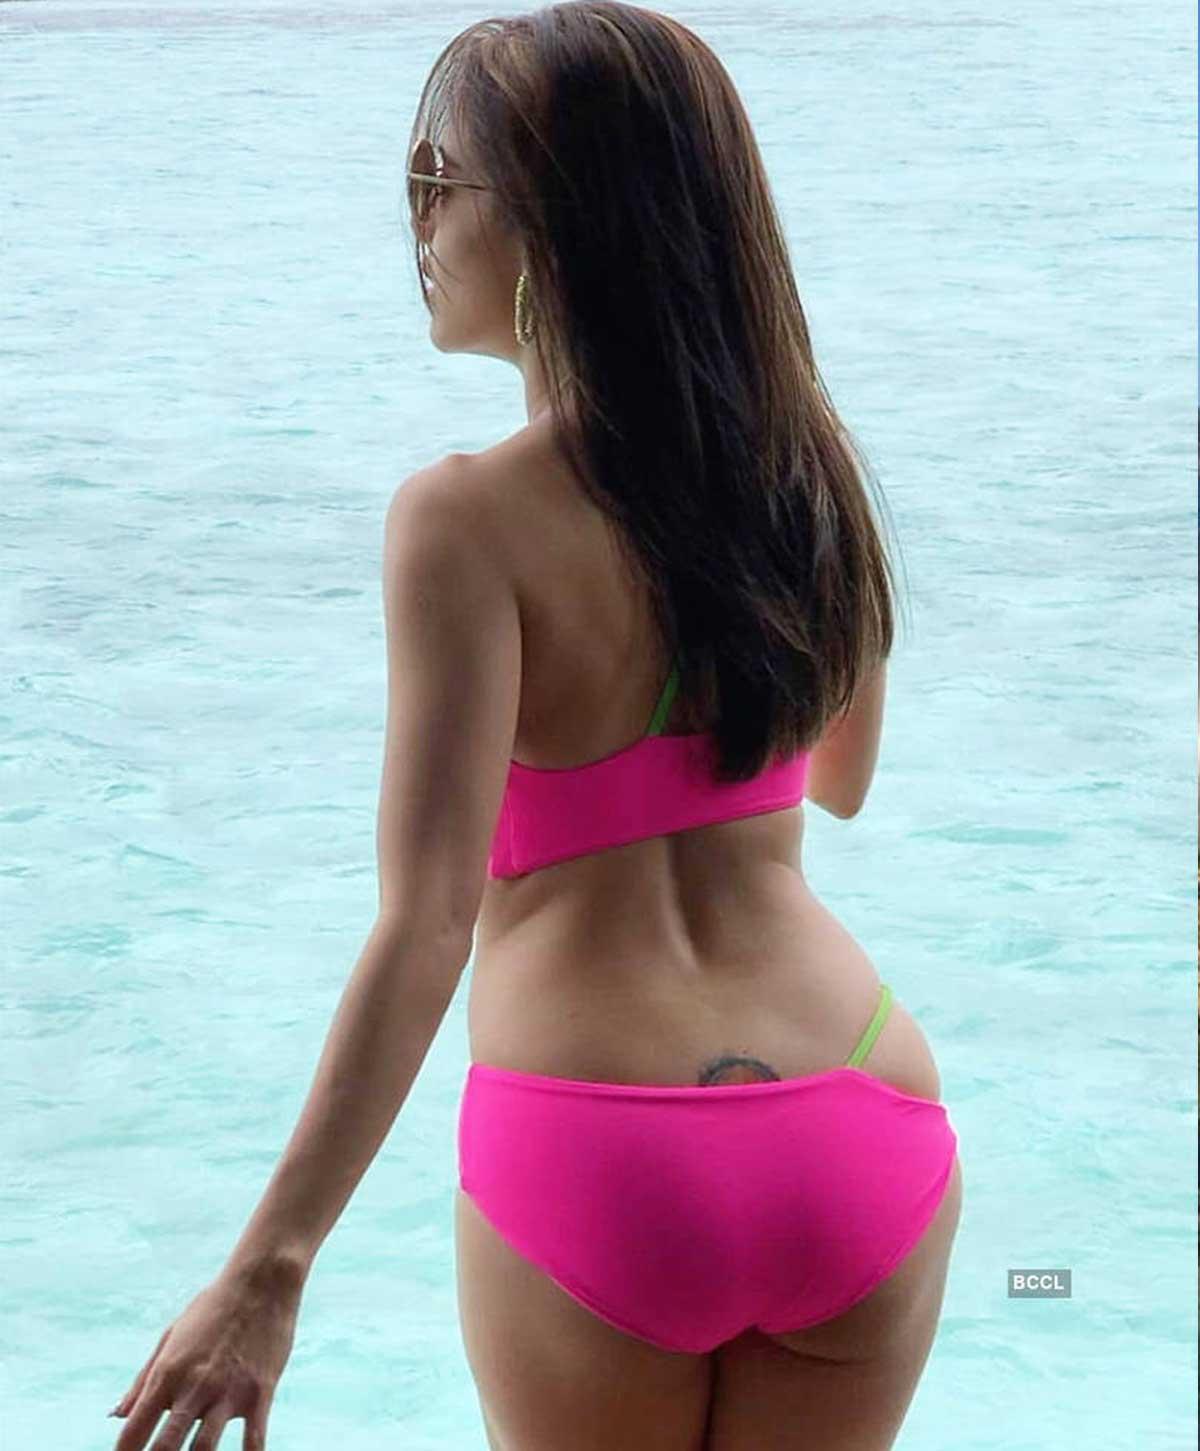 nushrat-bharucha-hot-ass-in-pink-bikini